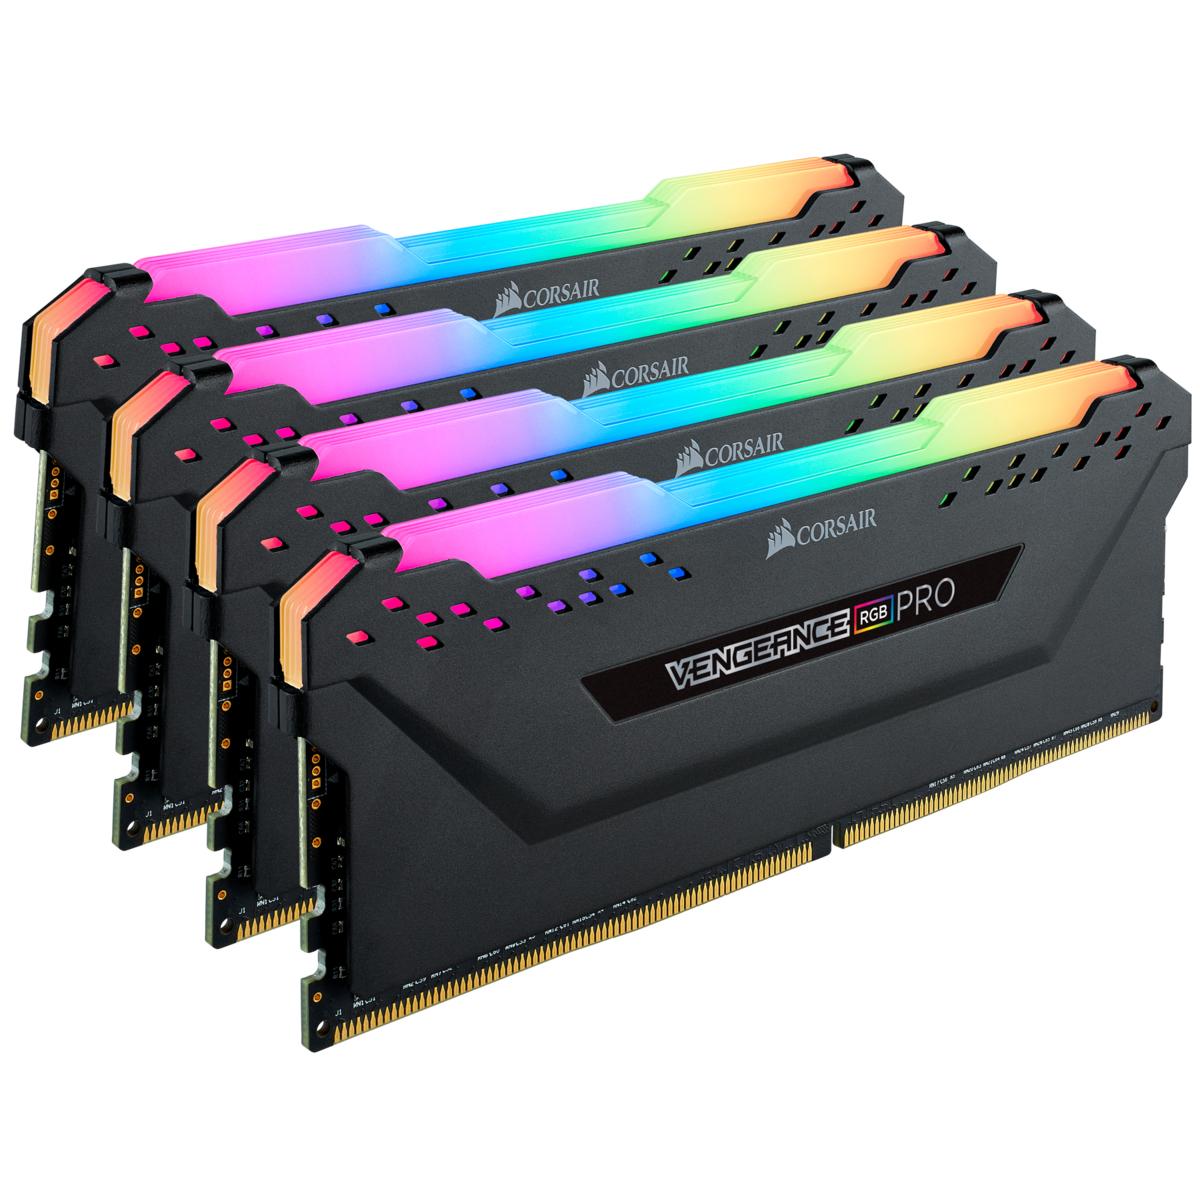 Corsair Vengeance RGB PRO - DDR4 - 32 GB: 4 x 8 GB